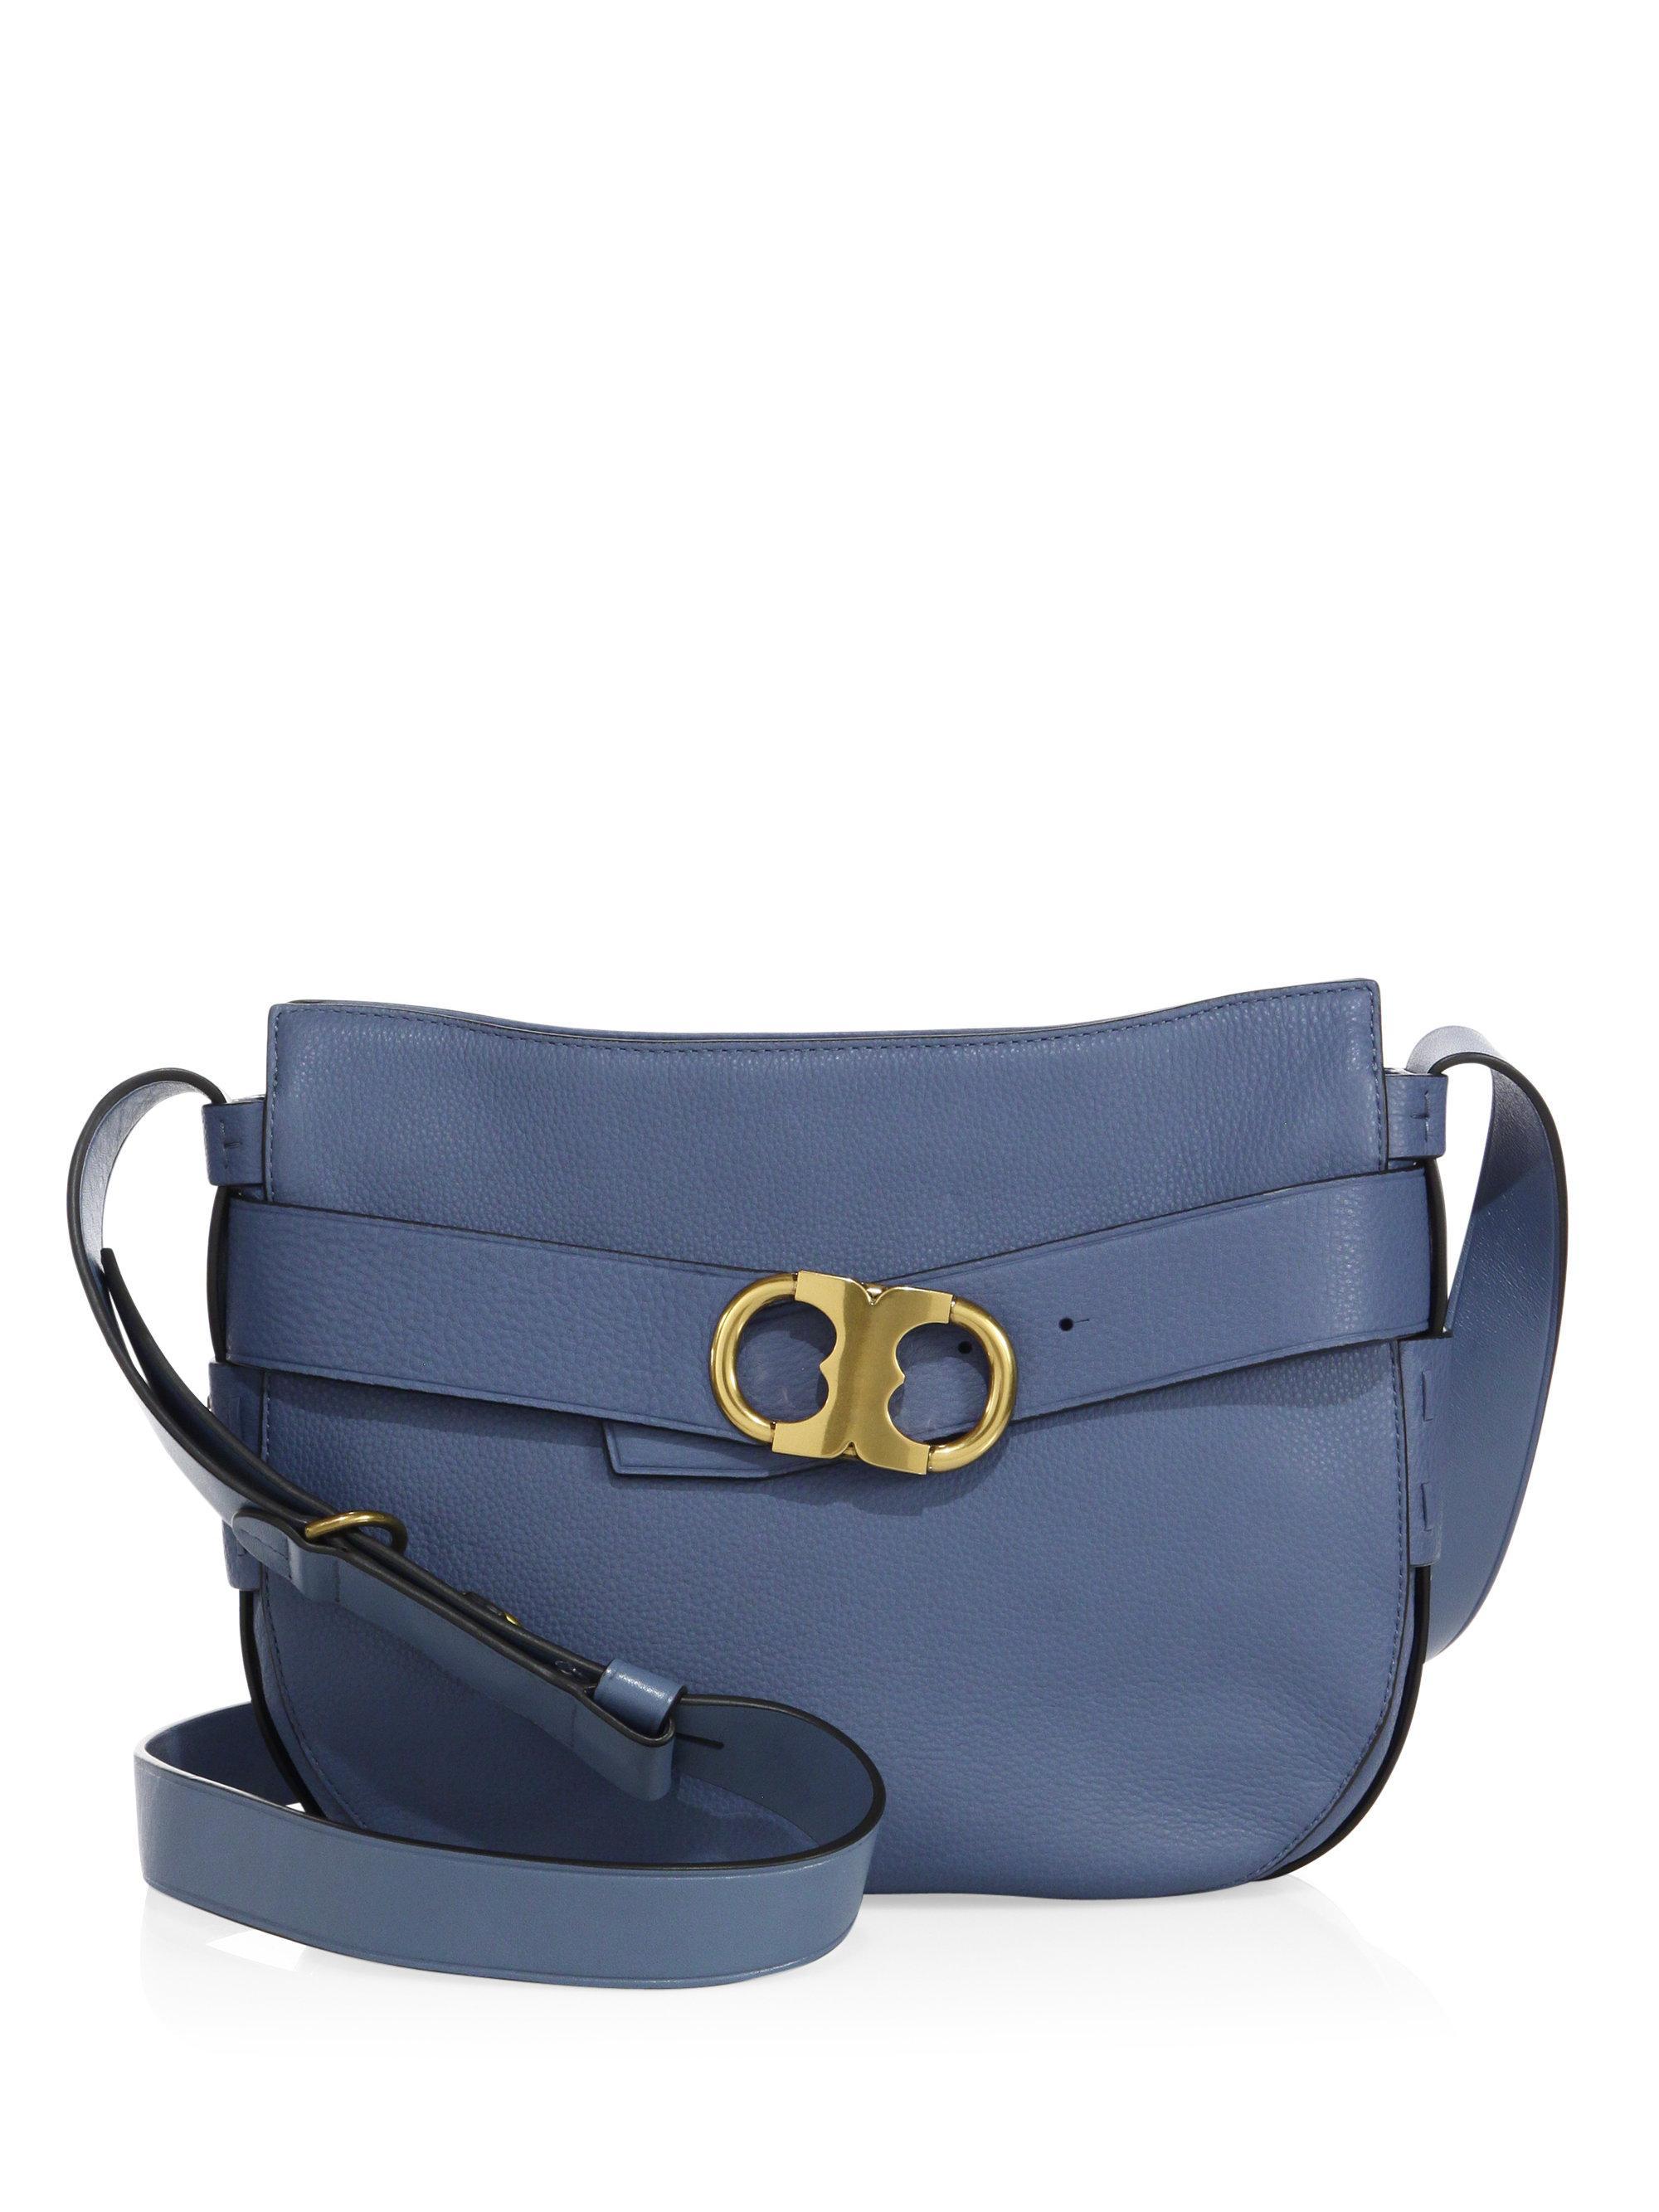 ee185000d2a6 Lyst - Tory Burch Gemini Link Leather Crossbody Bag in Blue